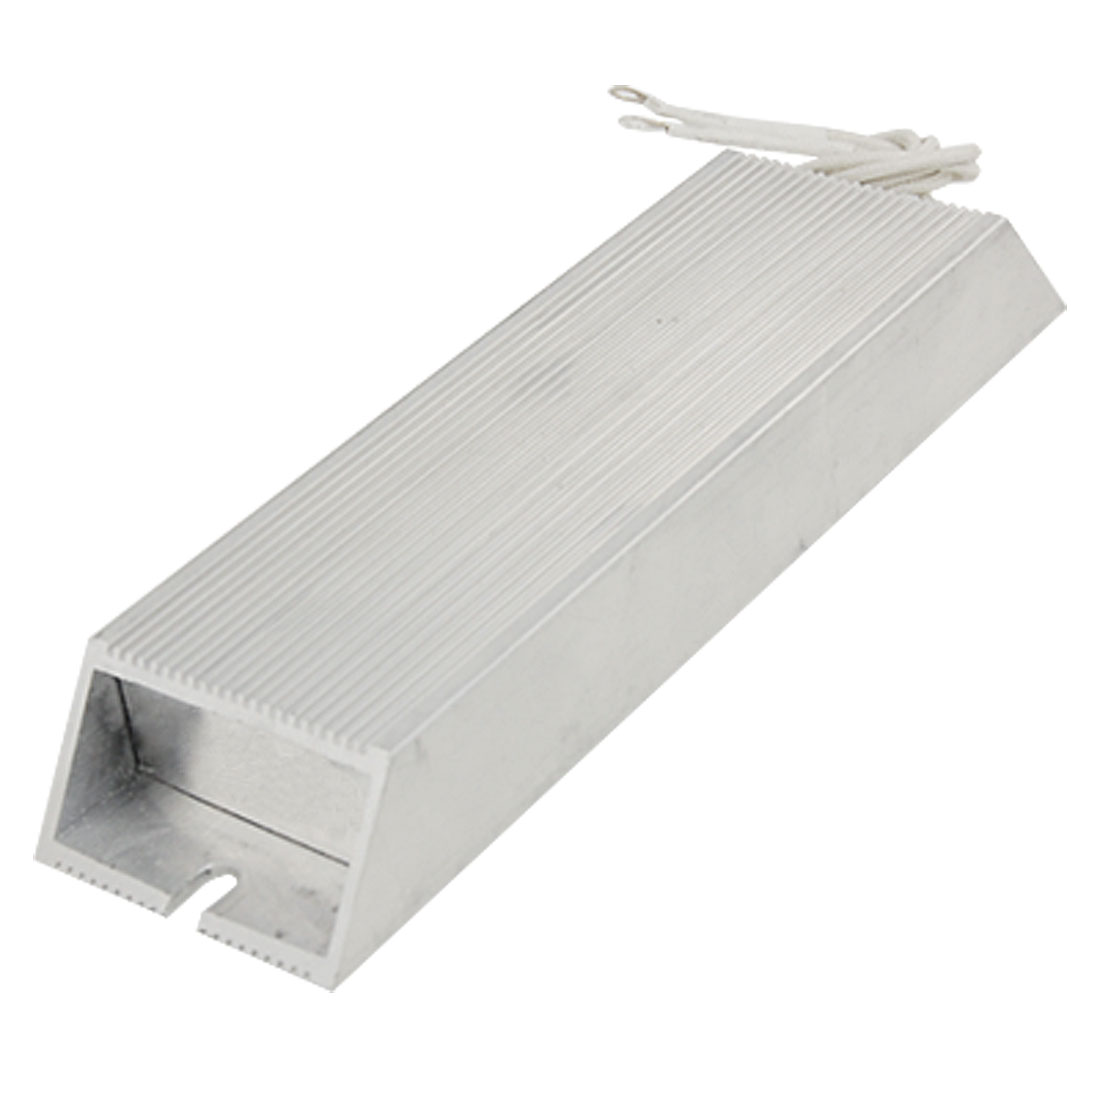 300W 100ohm 5% Aluminum Housed Resistor Silver Tone